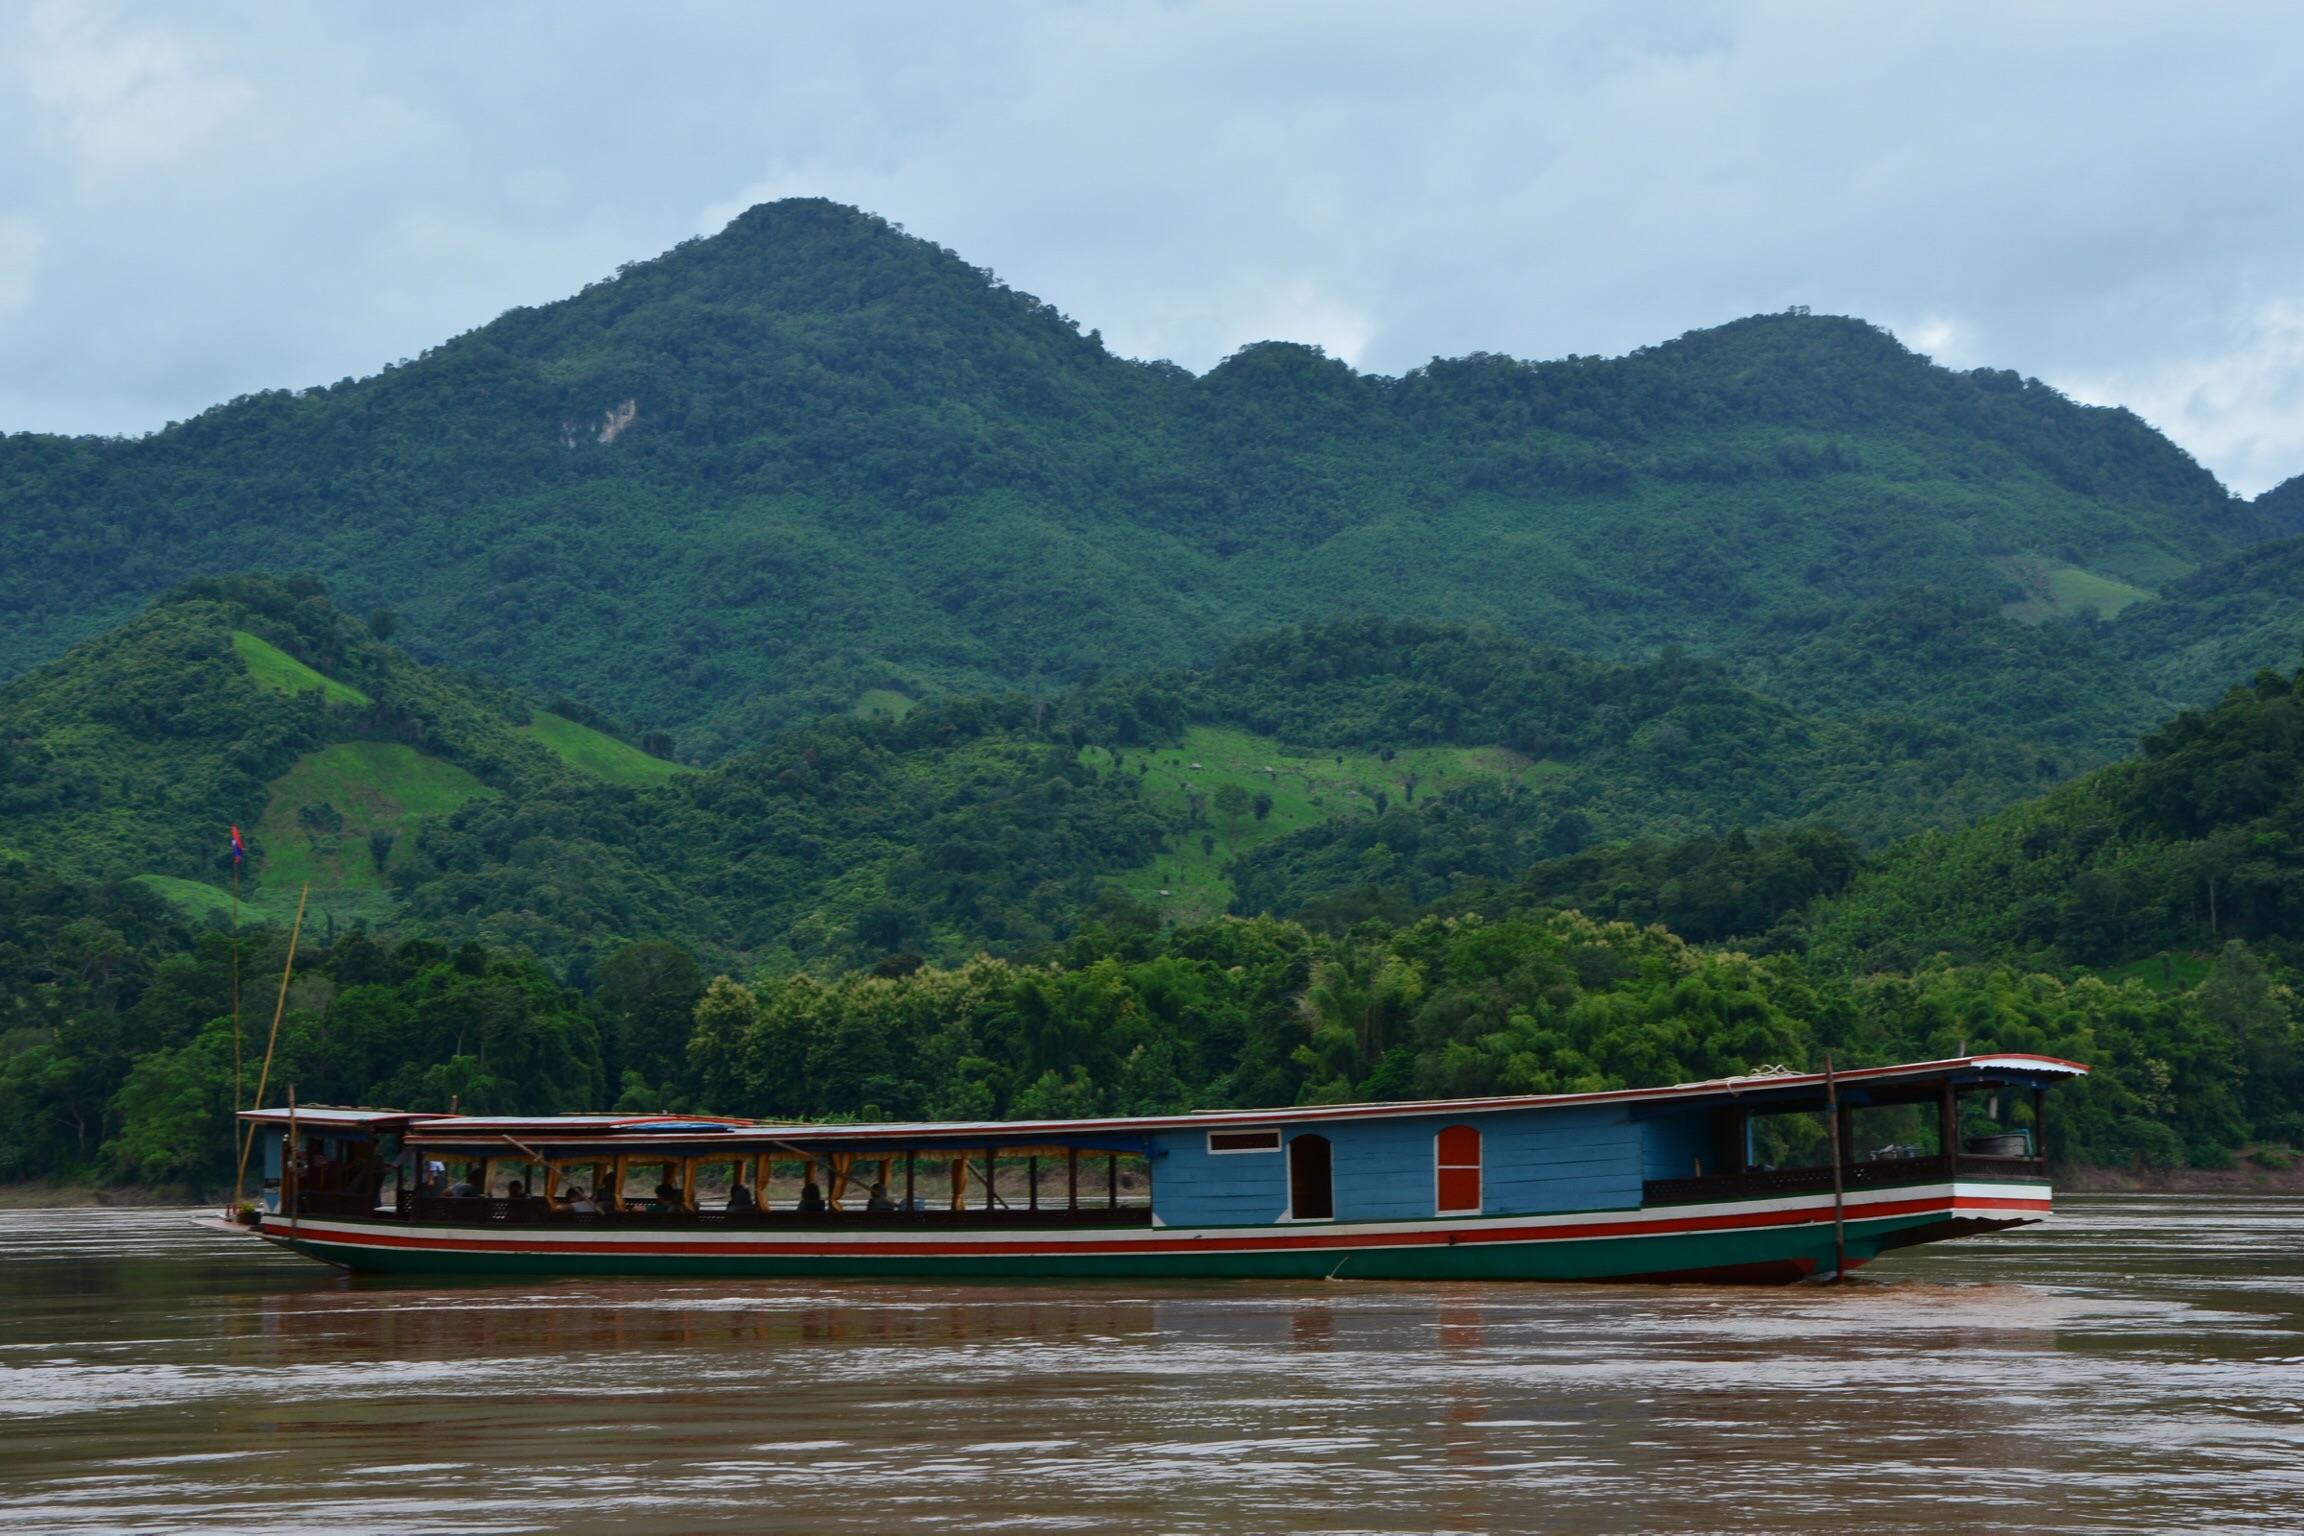 Longboating on the Mekong River.